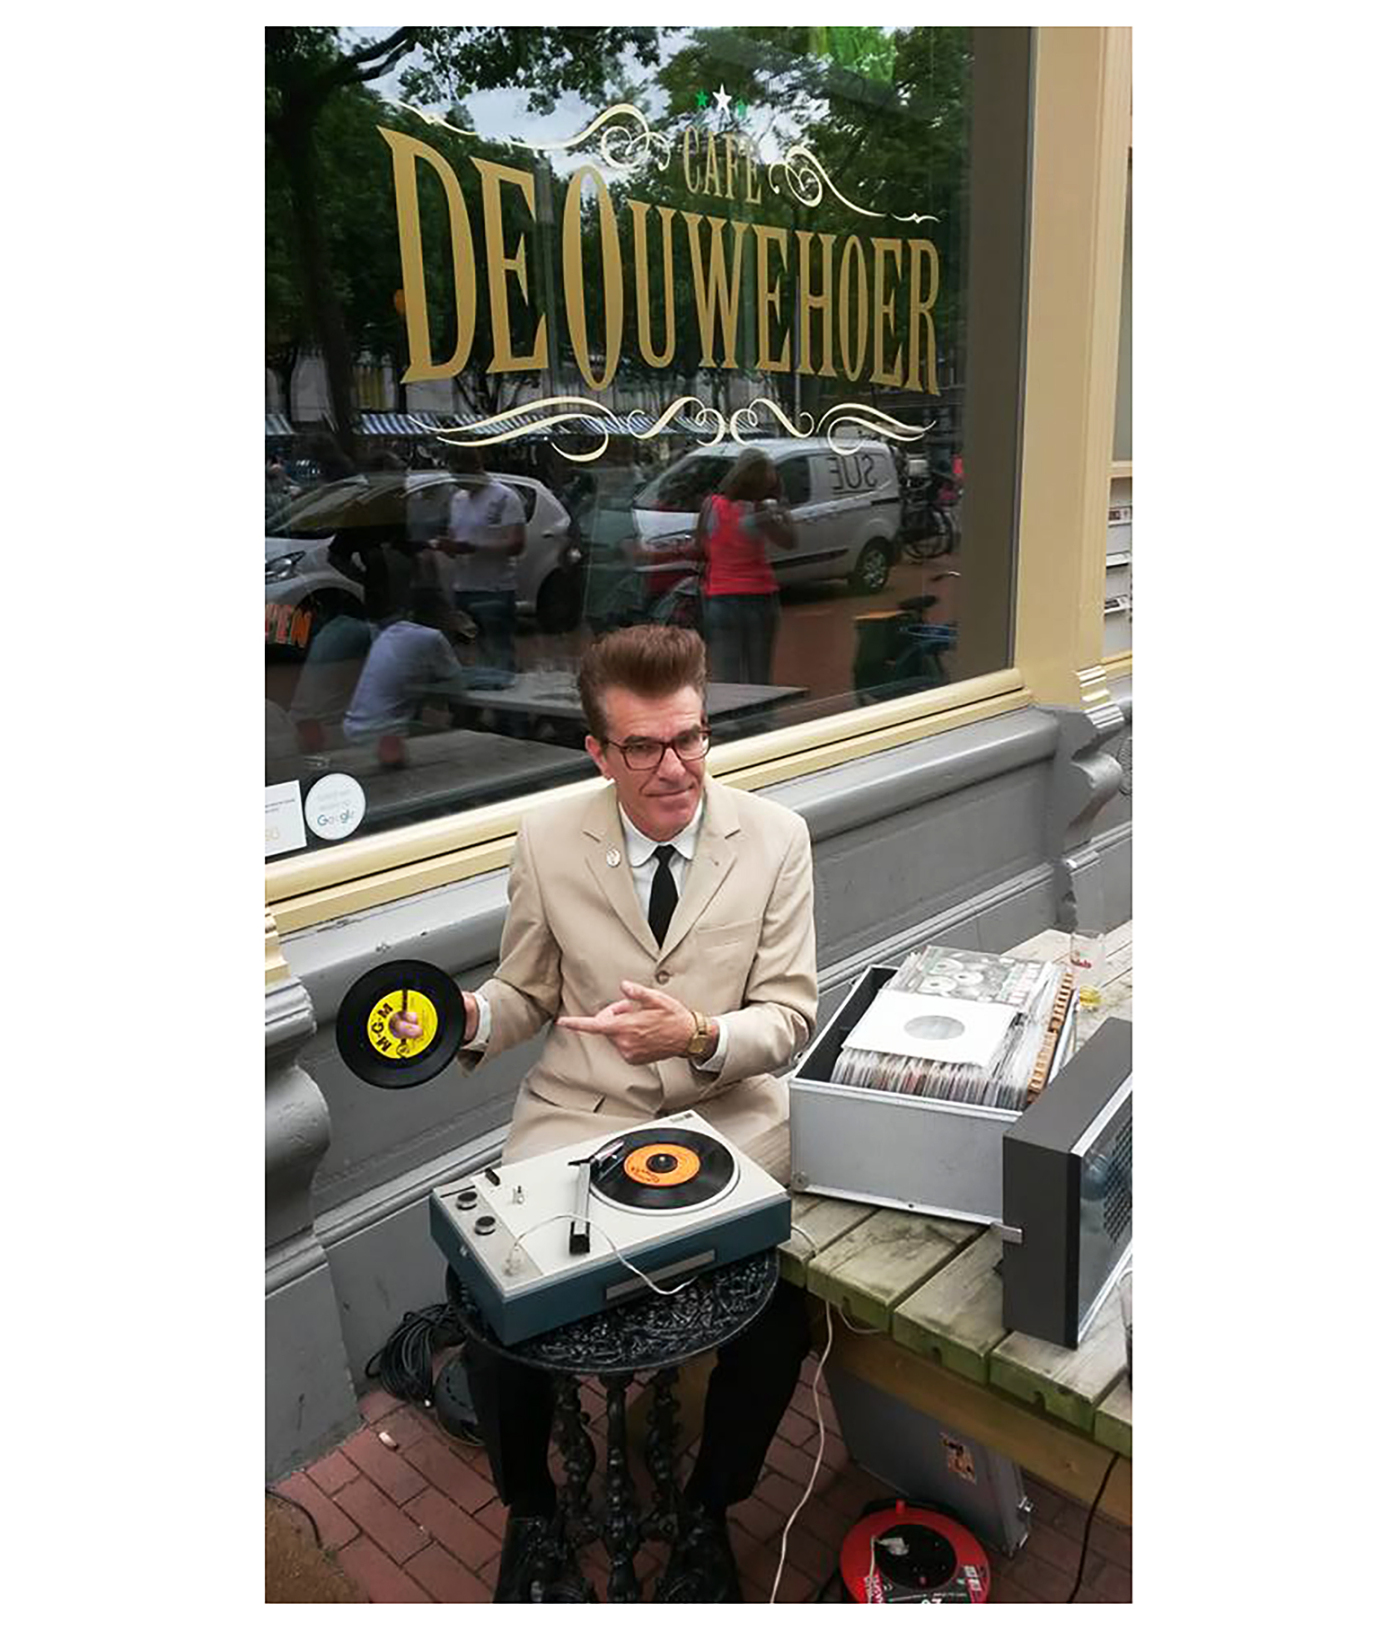 DeOuwehoer_Peter